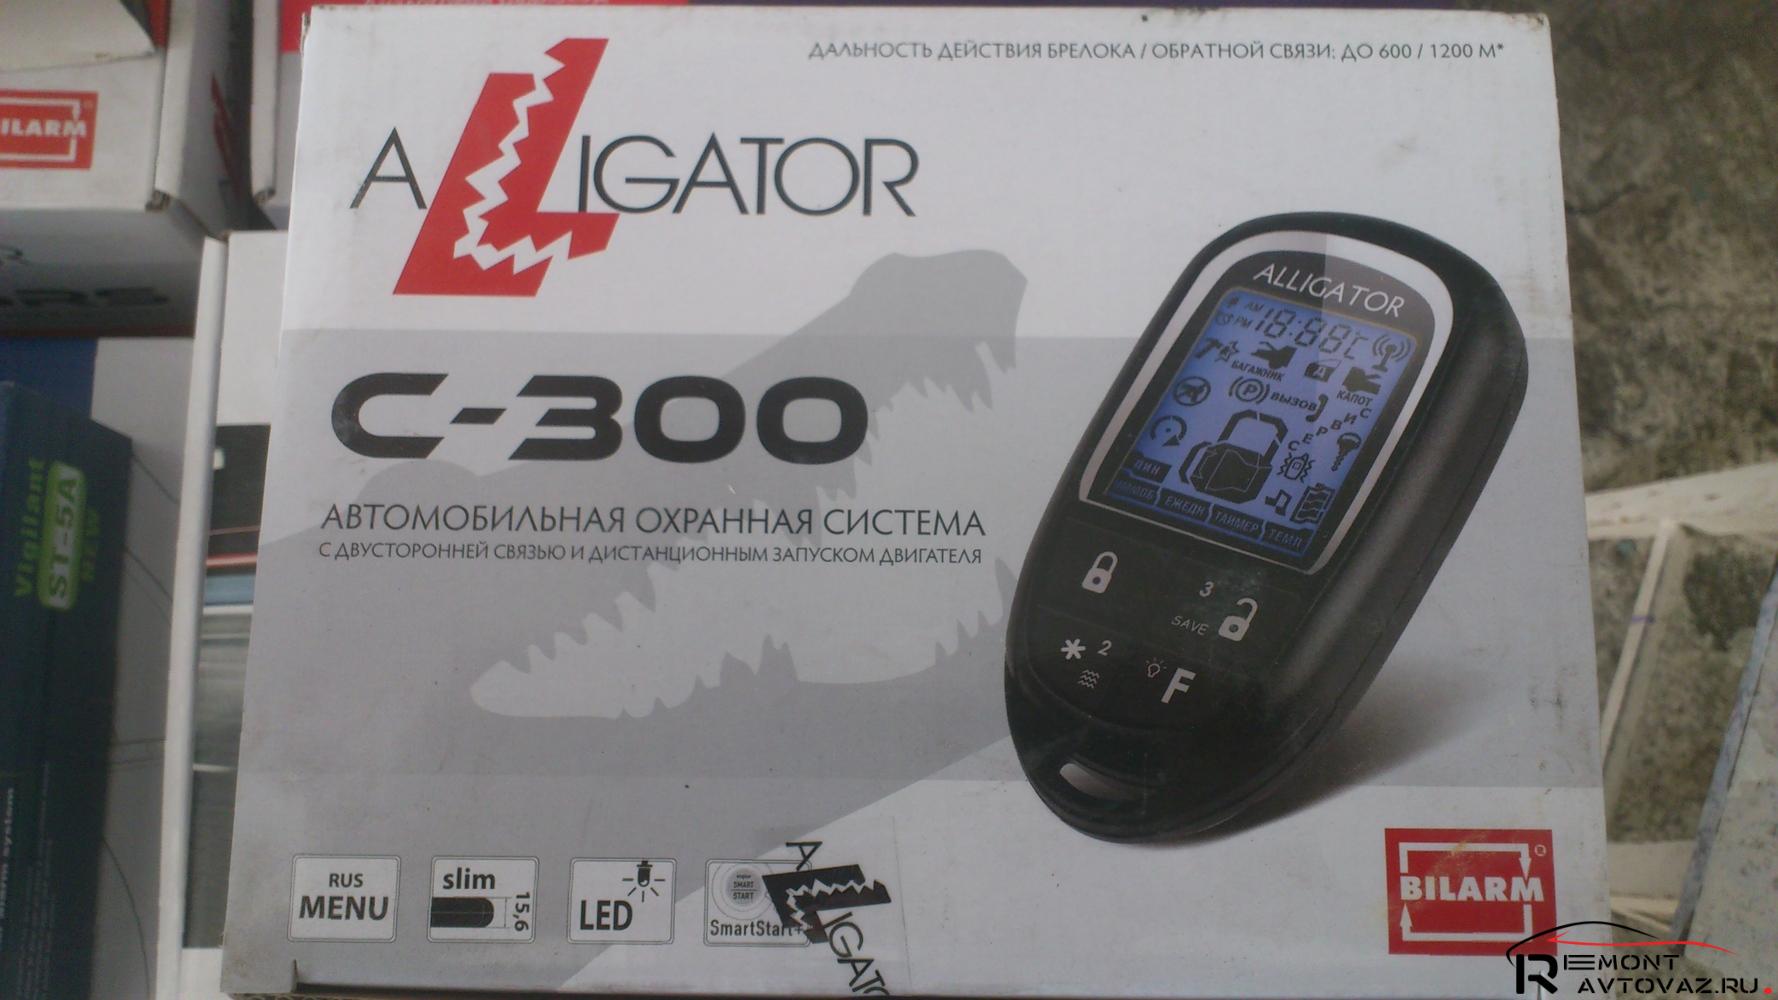 Aligator c-300 фото брелка